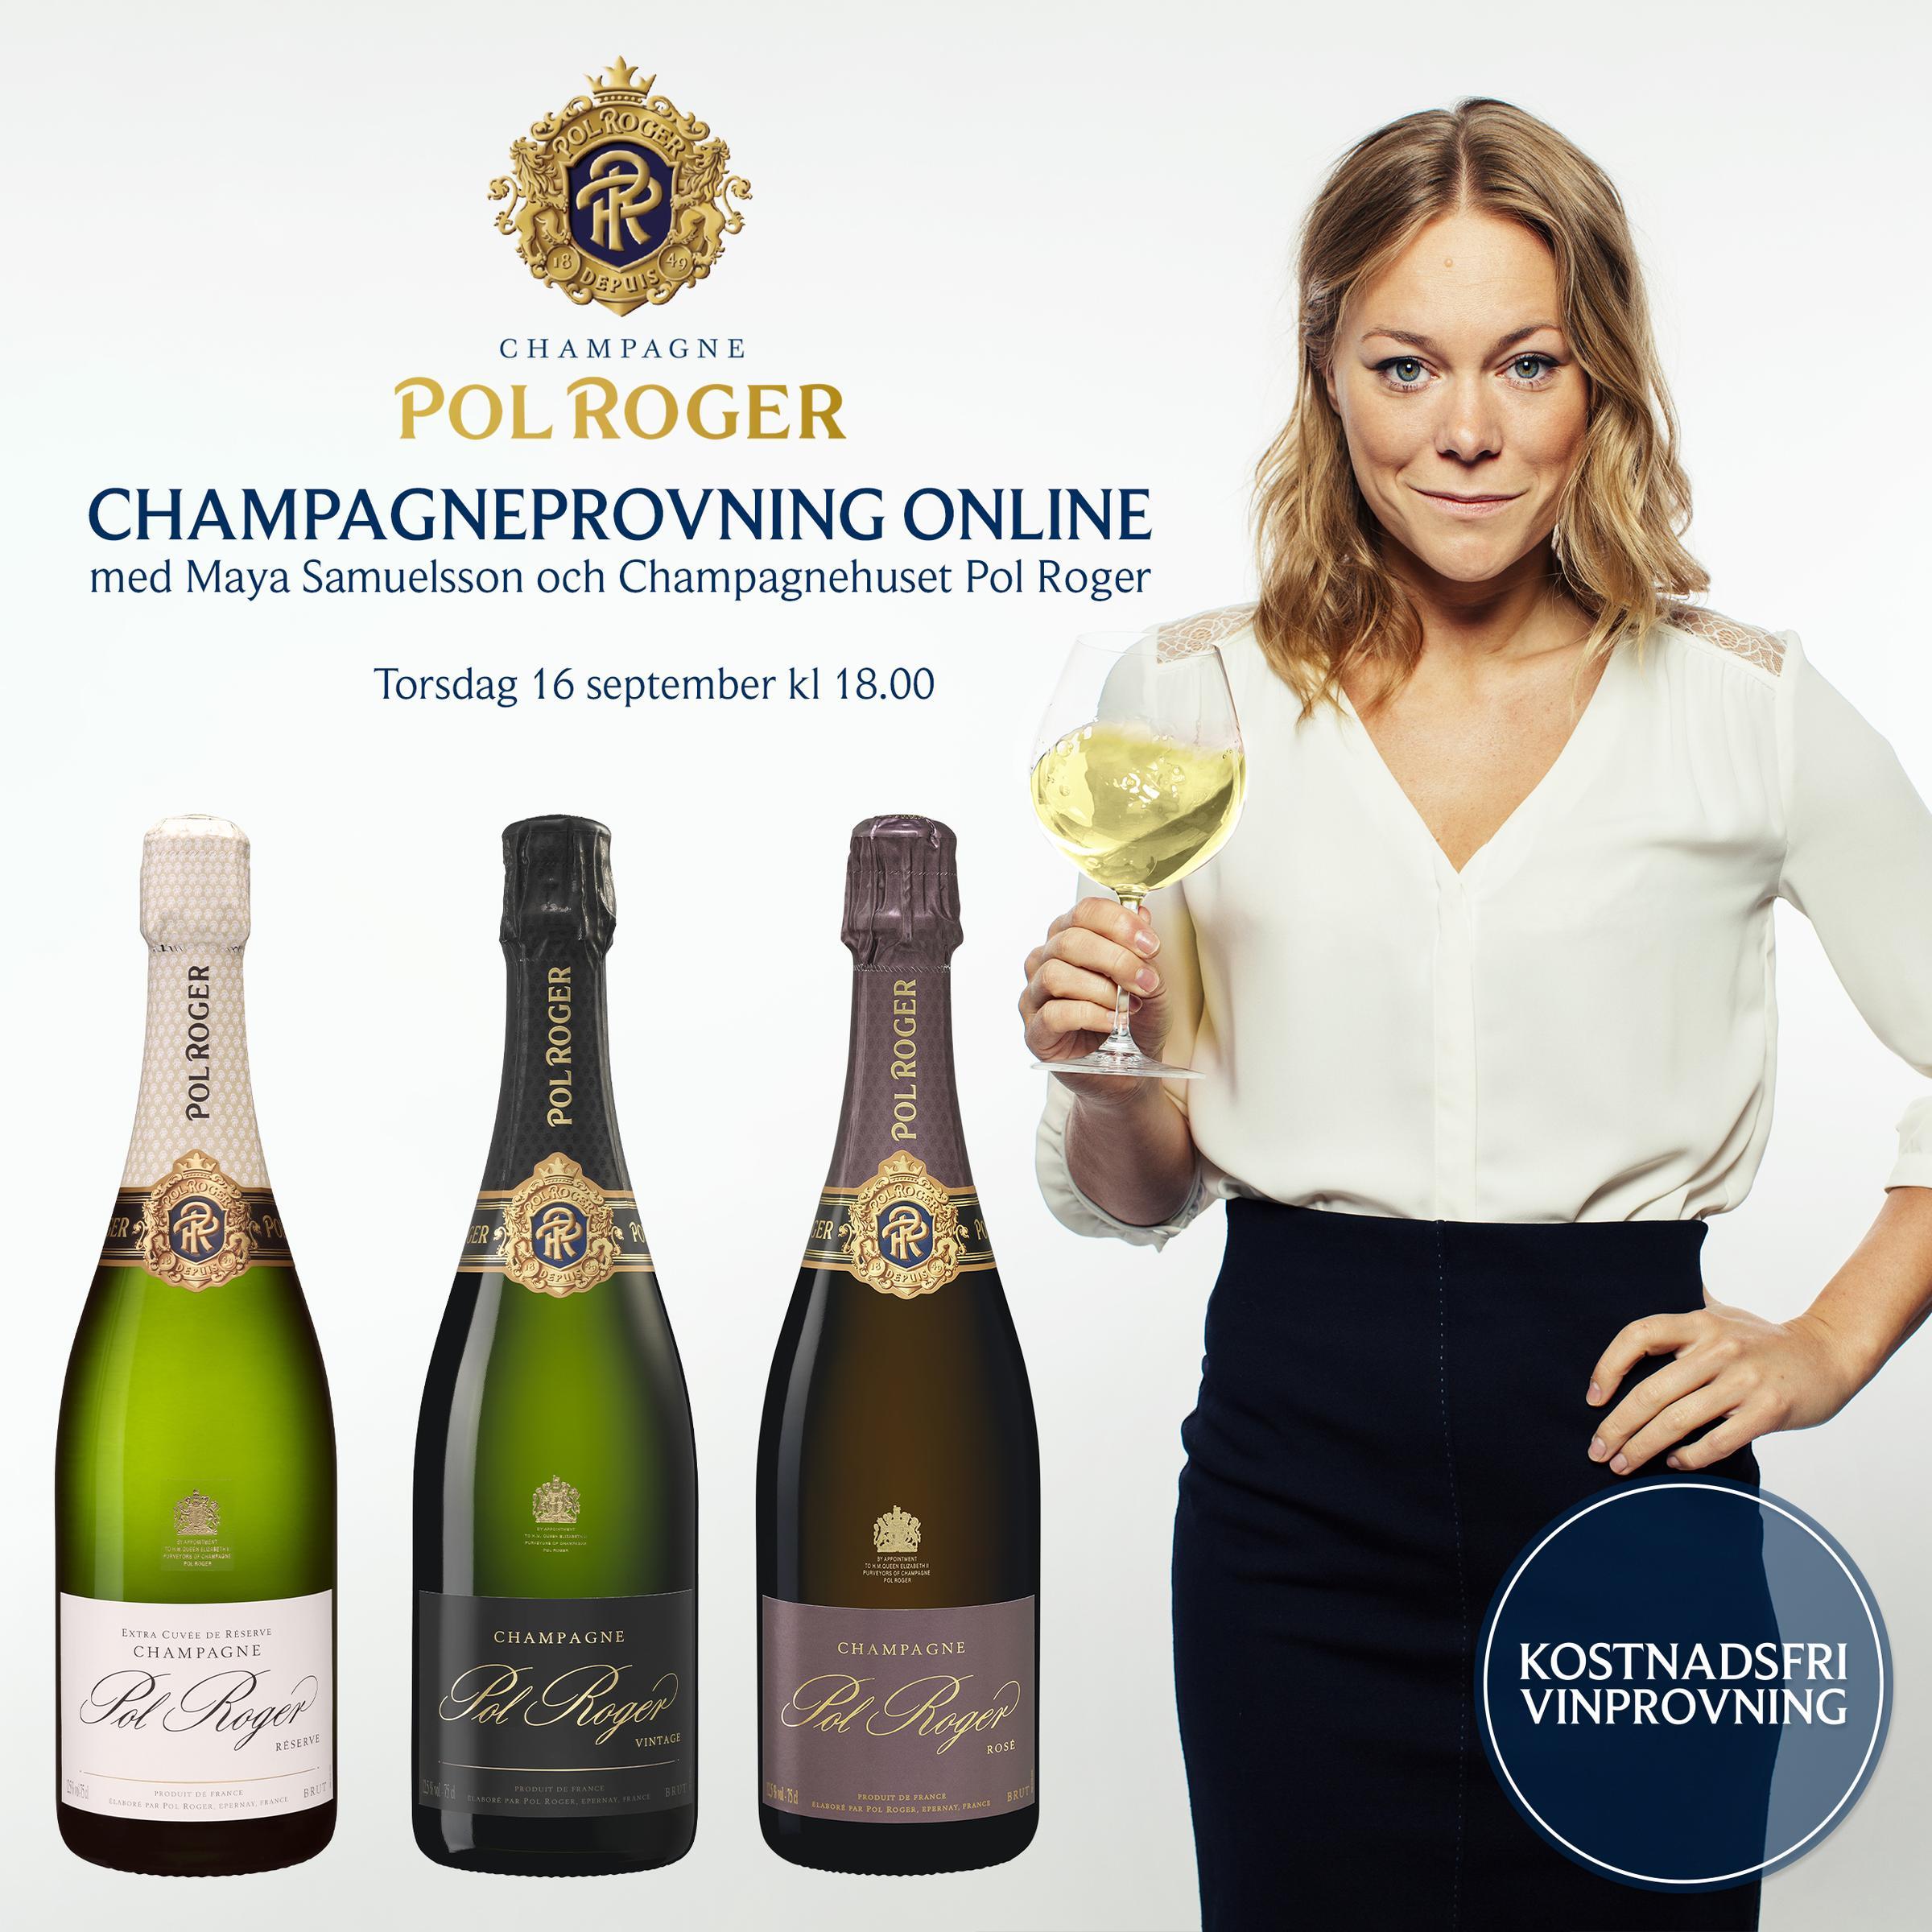 Champagneprovning med Maya Samuelsson